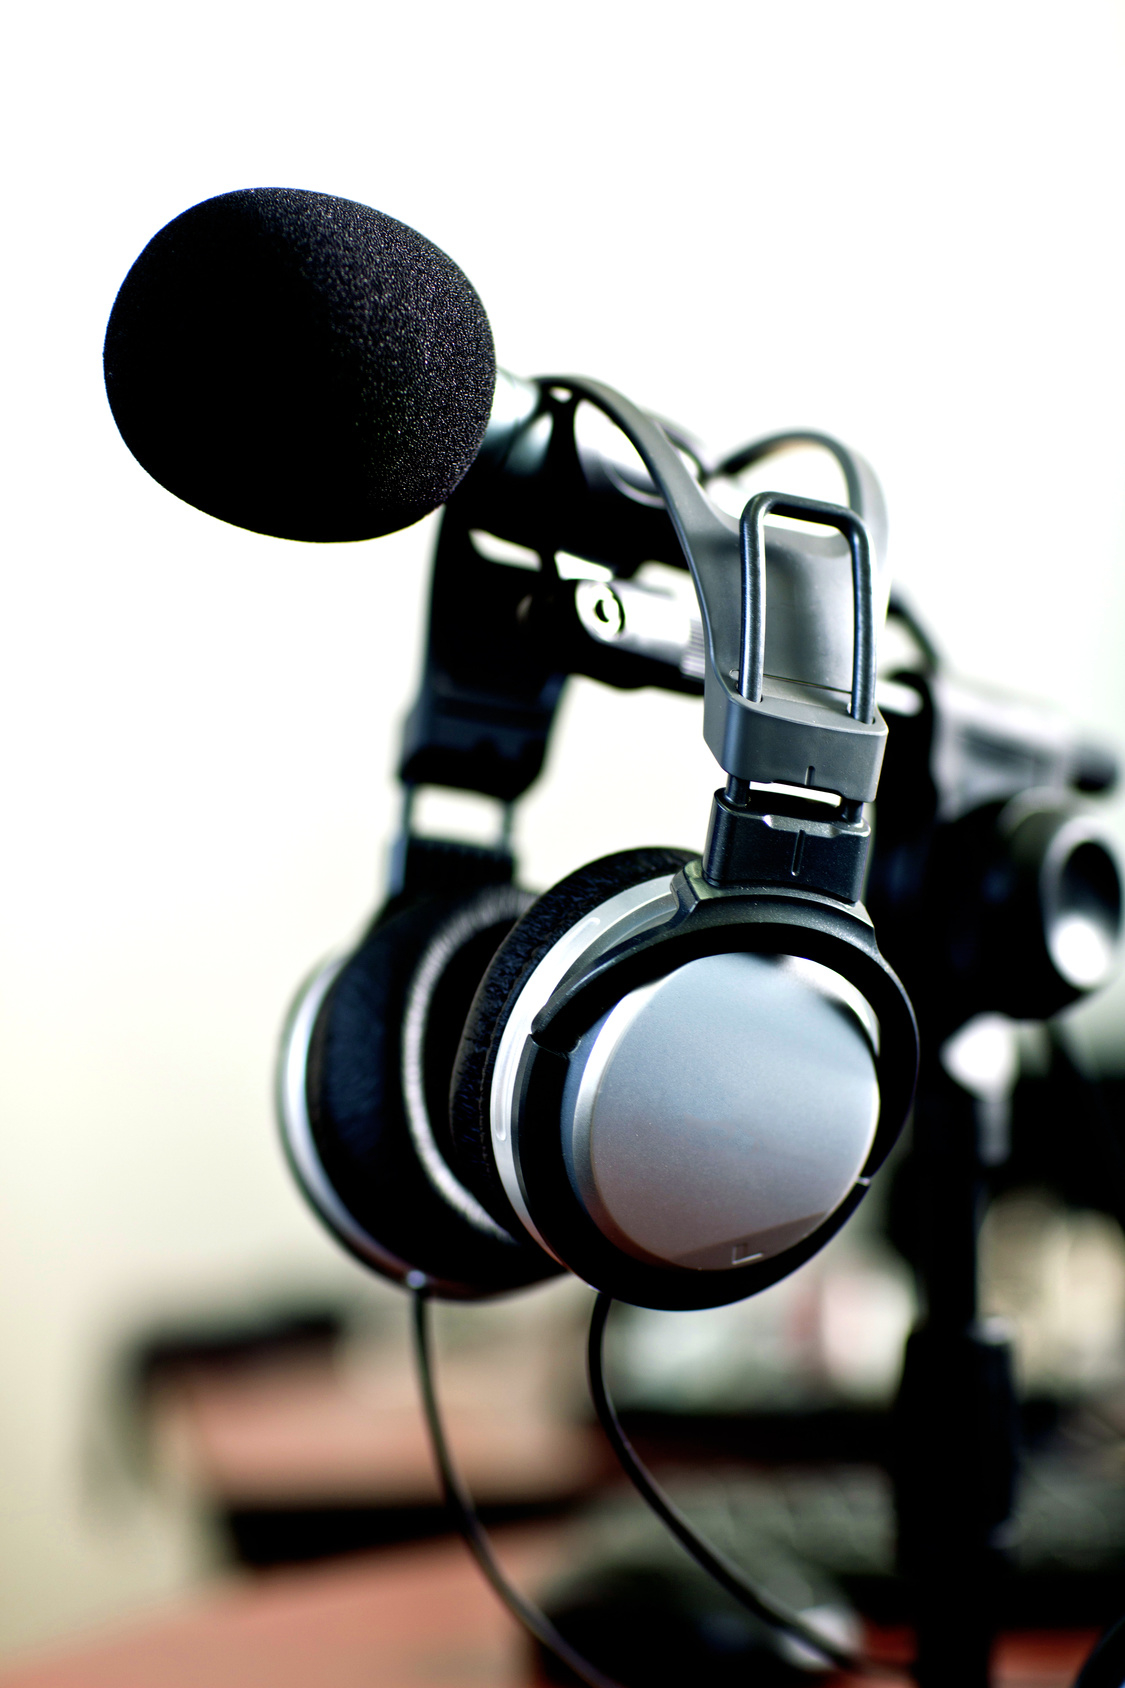 Radio El Saddai Inter - Brooklyn, NY 11210 - (718)758-5840 | ShowMeLocal.com